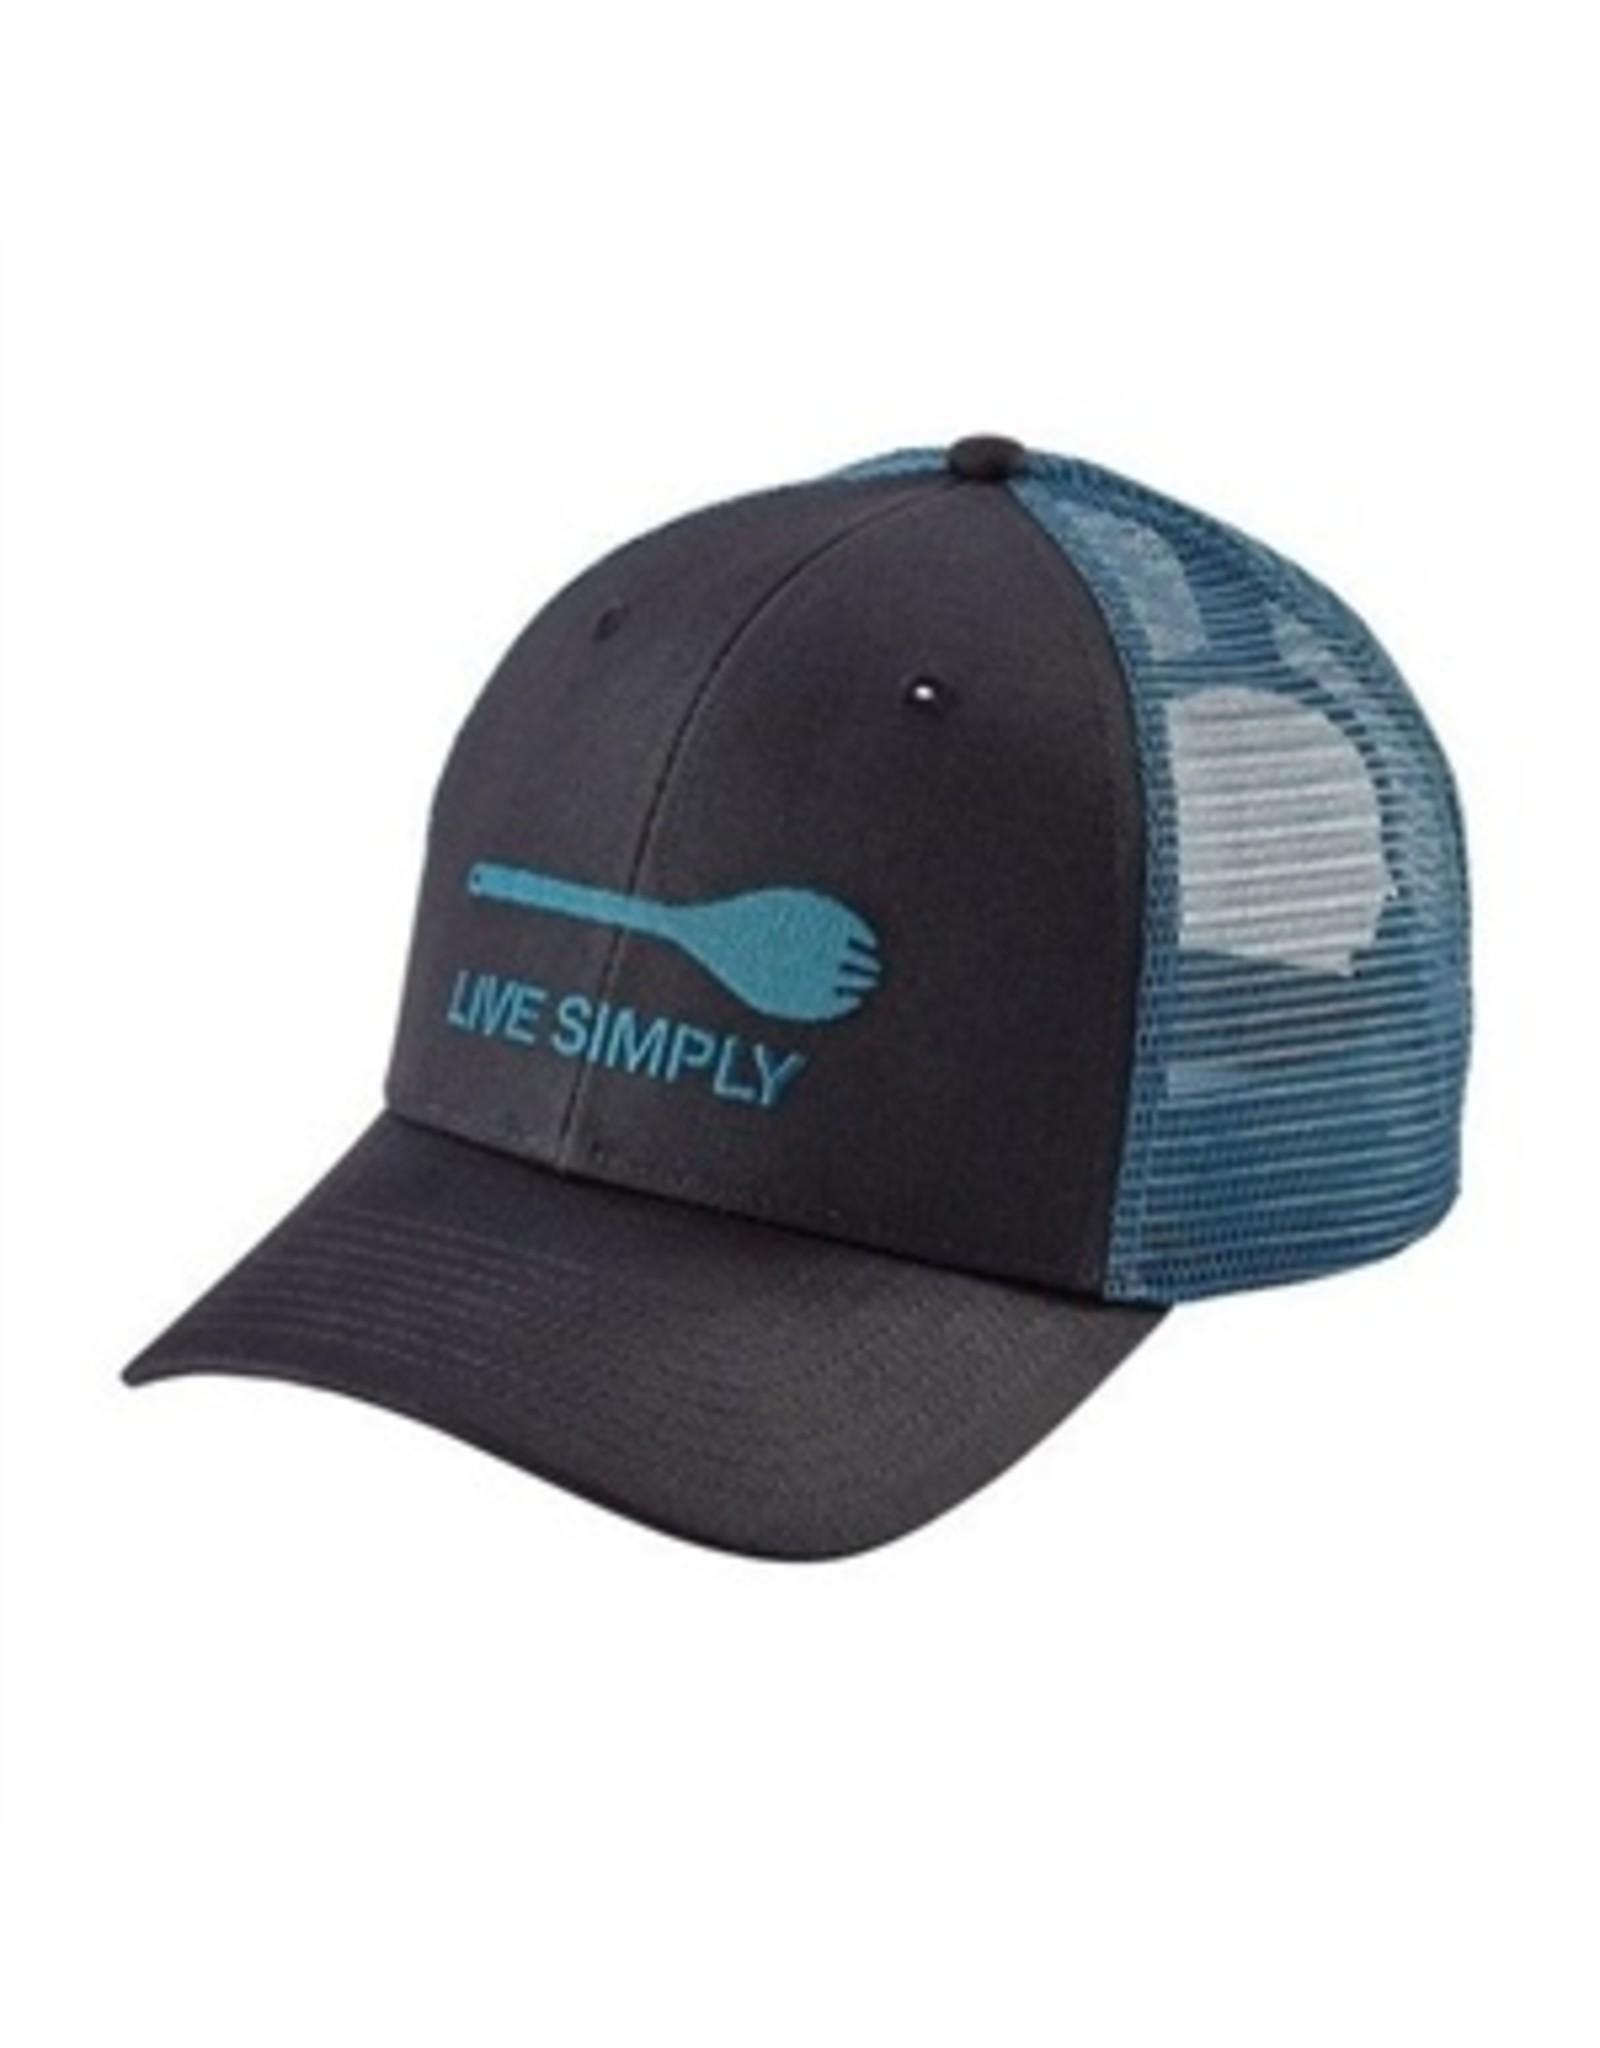 Patagonia Patagonia - Live Simply Spork Trucker Hat